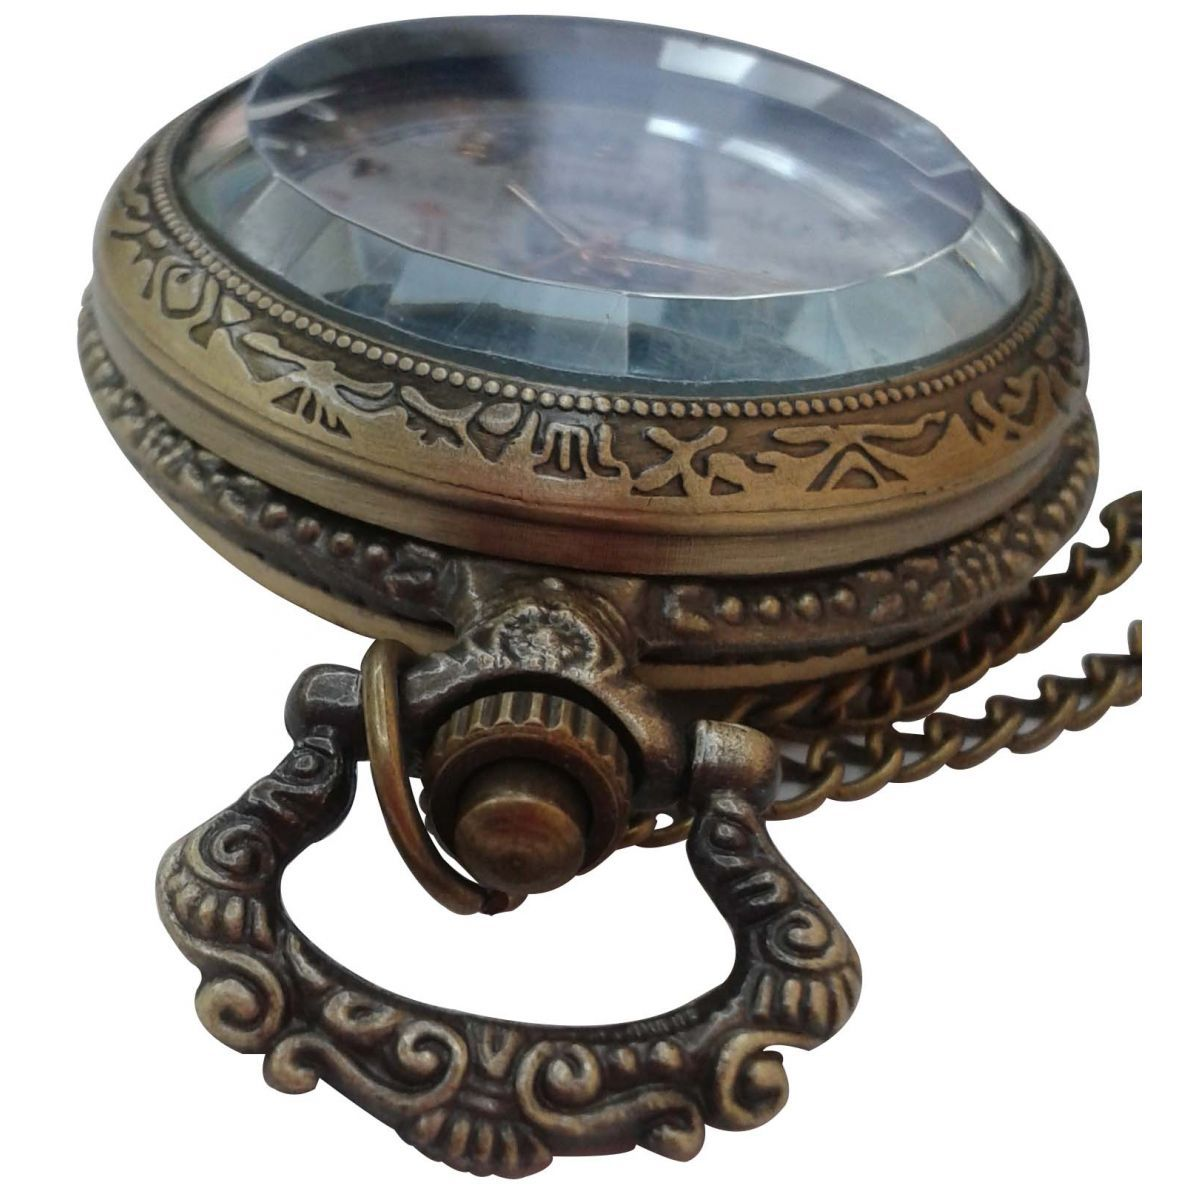 Relógio Vintage de Bolso   - Mundo Thata